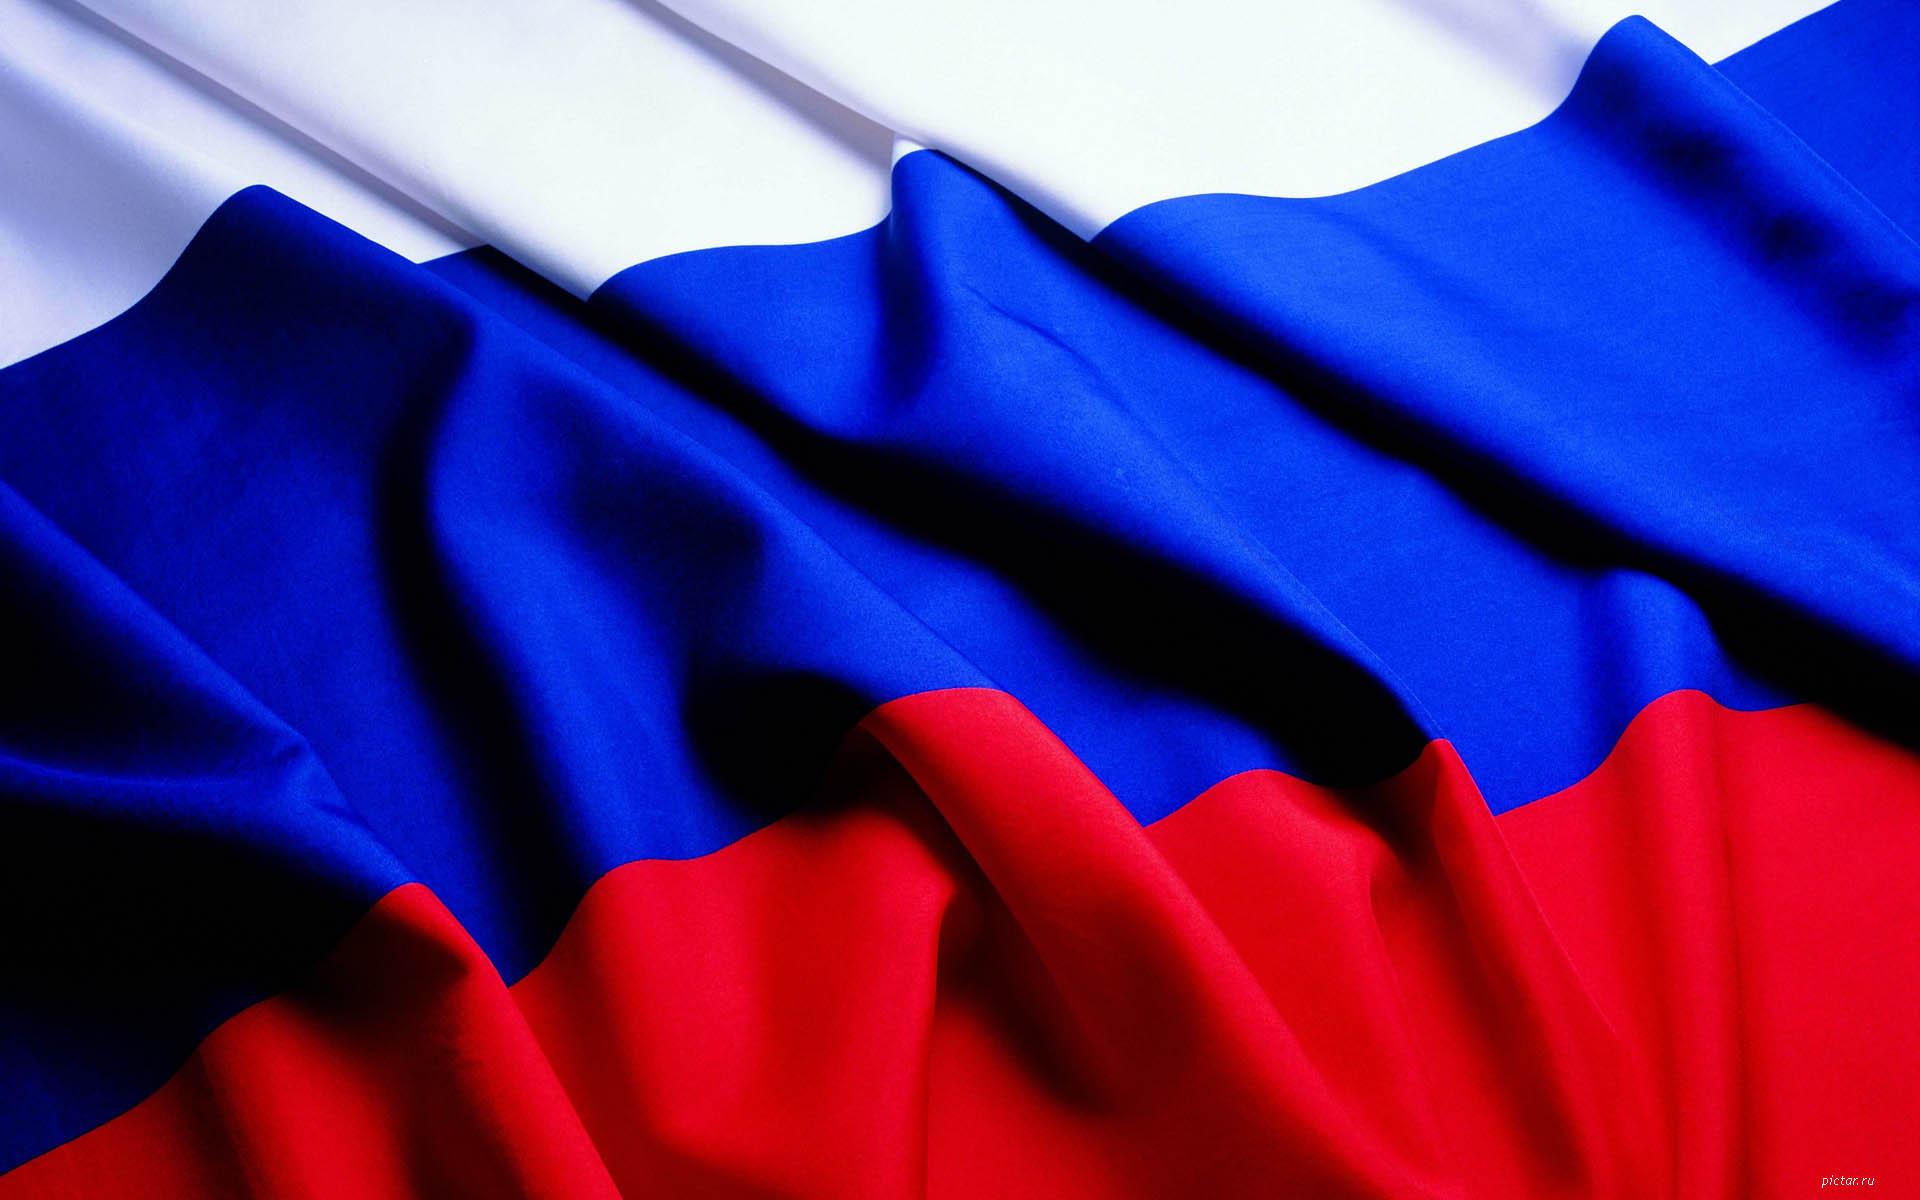 Картинка Россия - Картинки Флаги - Бесплатные картинки для ...: http://pictar.ru/img-rossiya-33015.htm